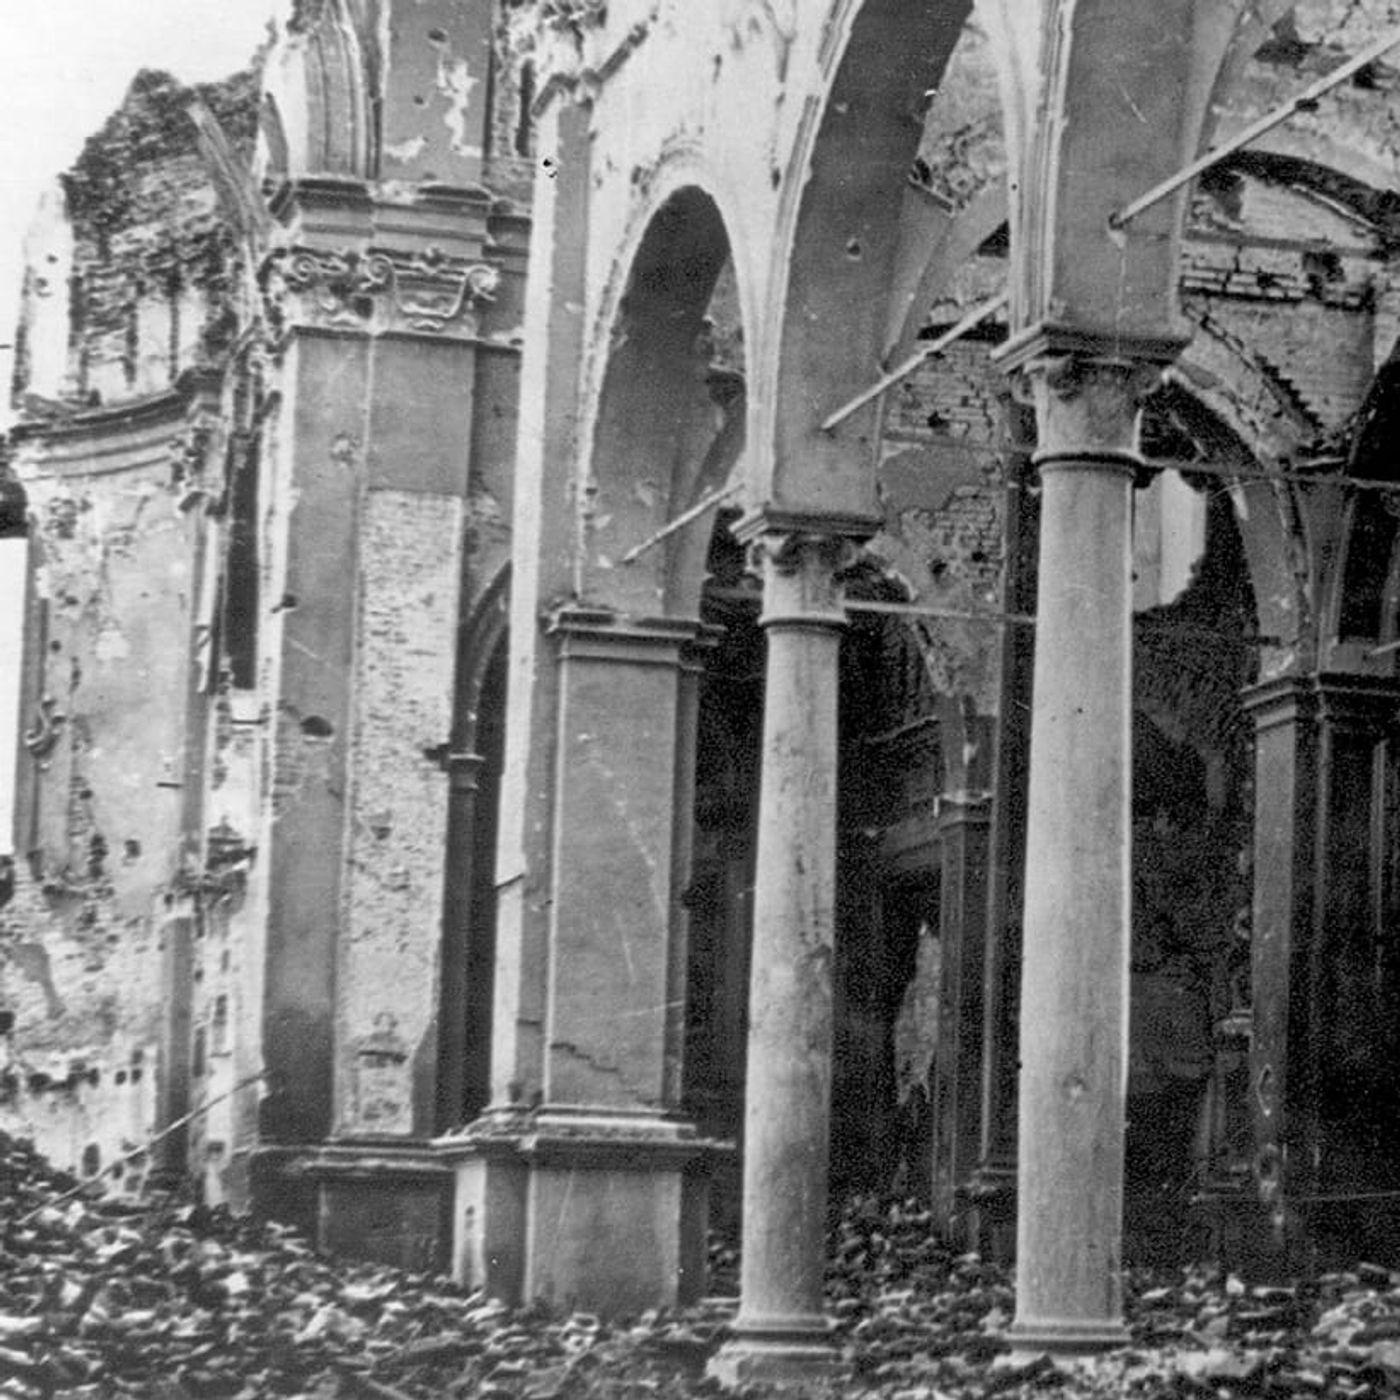 12 aprile 1945 un devastante bombardamento colpisce Argenta